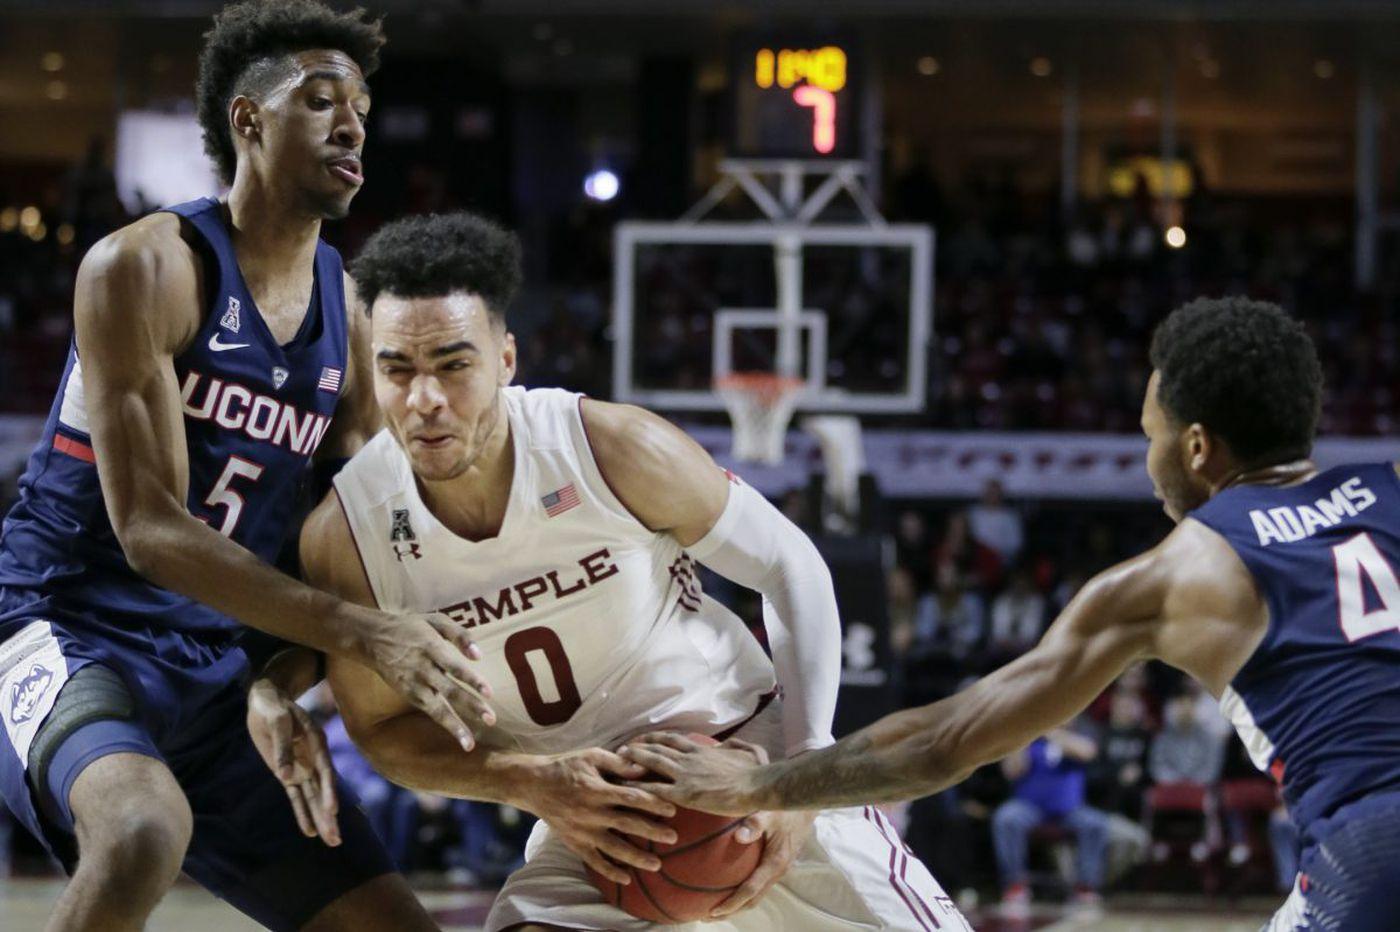 Temple's Obi Enechionyia wins AAC basketball scholar-athlete award